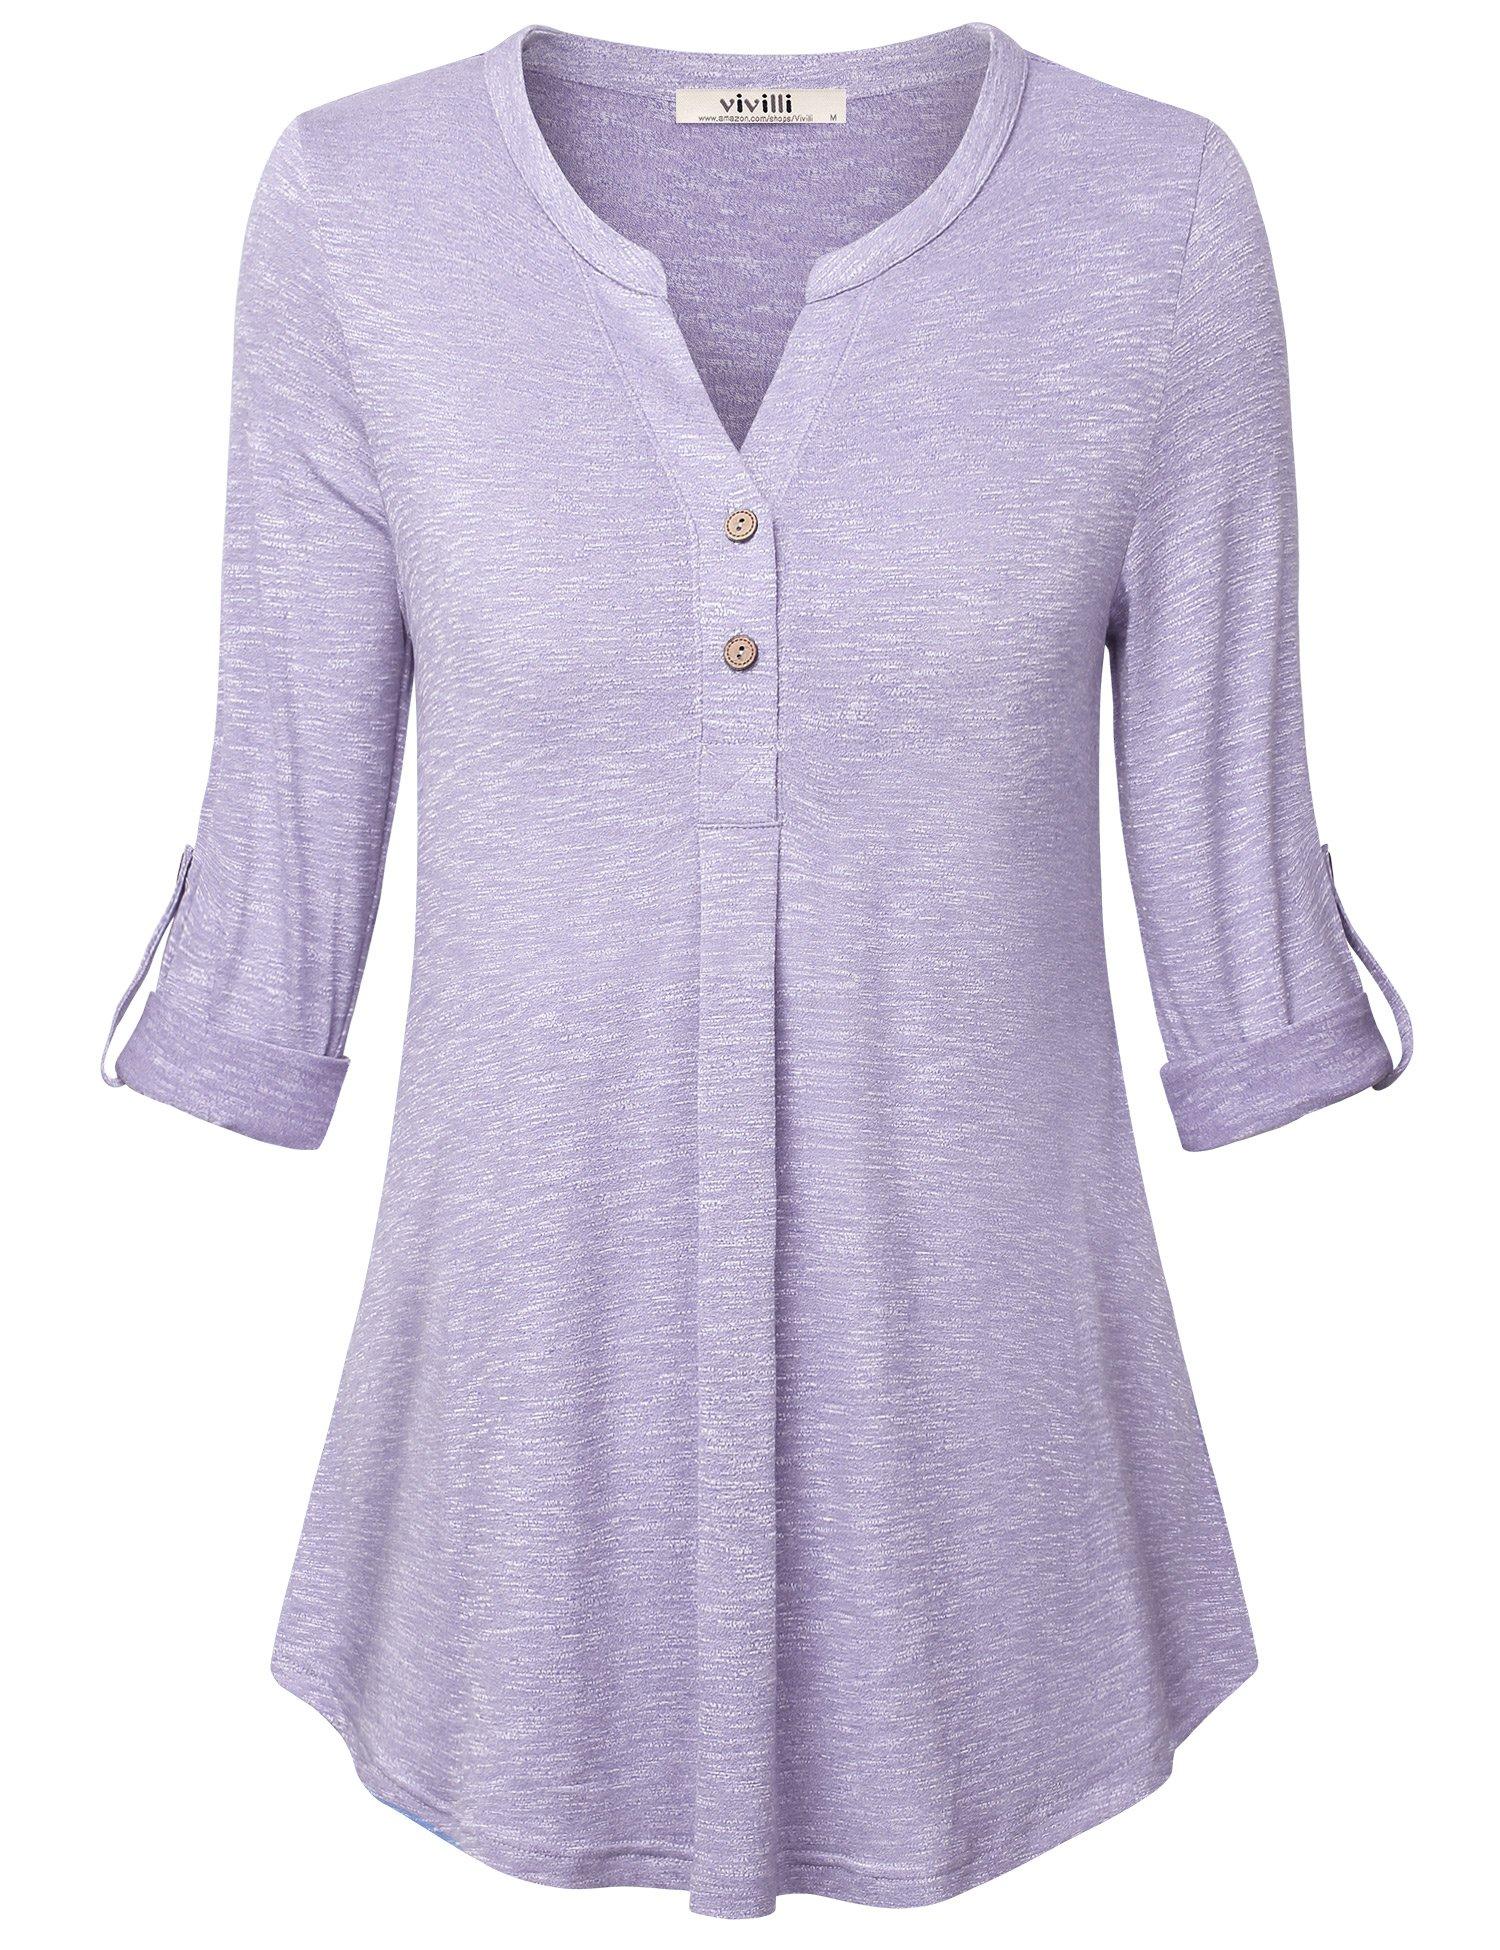 Vivilli,Tunic Tops for Women, 3/4 Sleeve Henley V Neck Blouses Casual Fitted Shirt (Large,Light Violet)